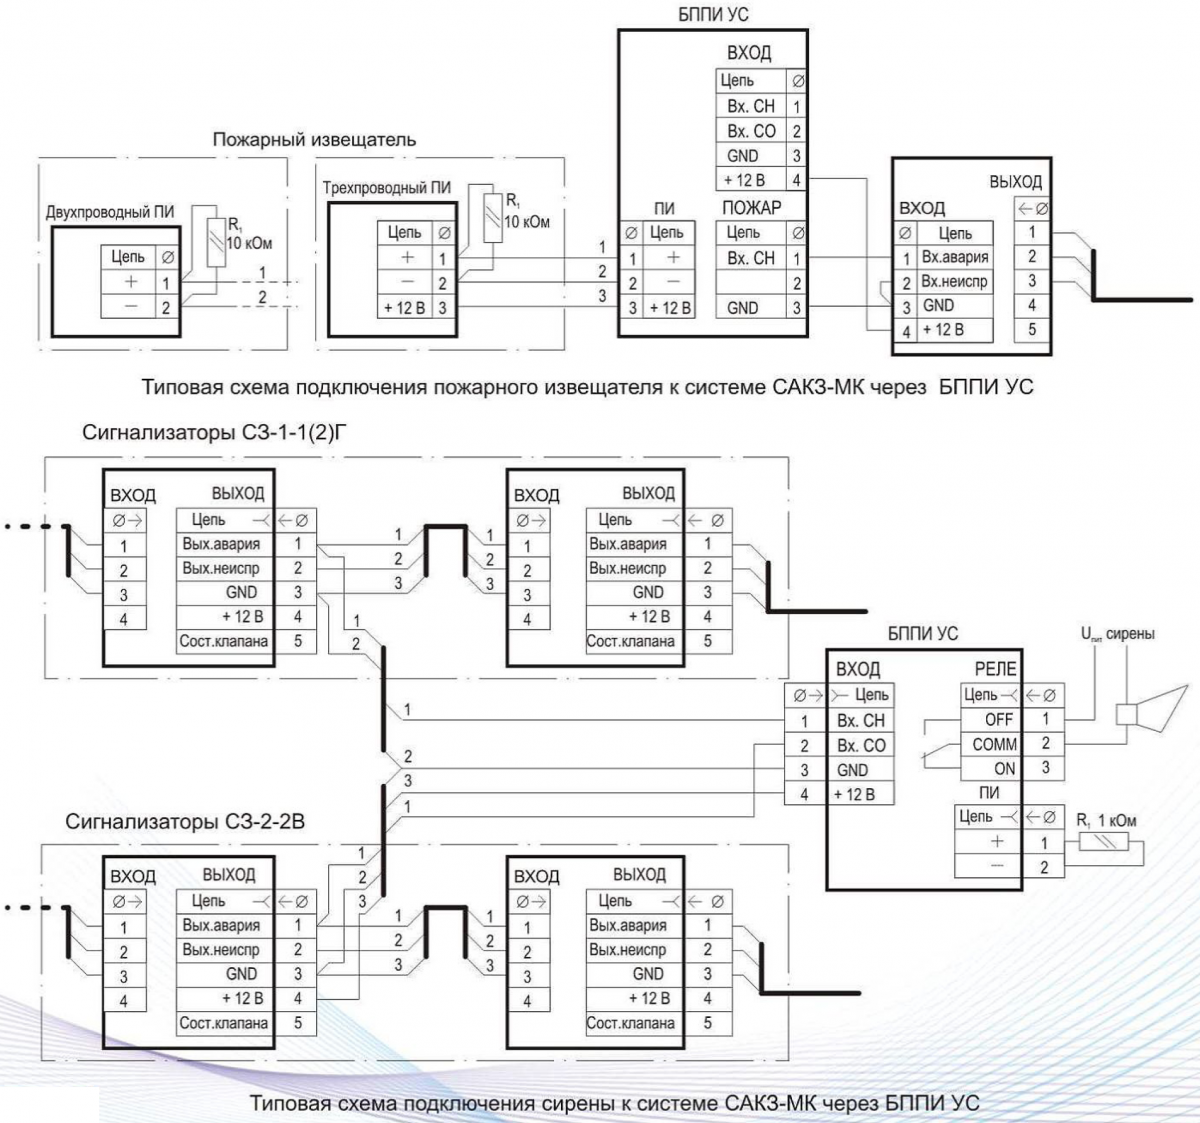 Схема сигнализатора загазованности сз-1-1г